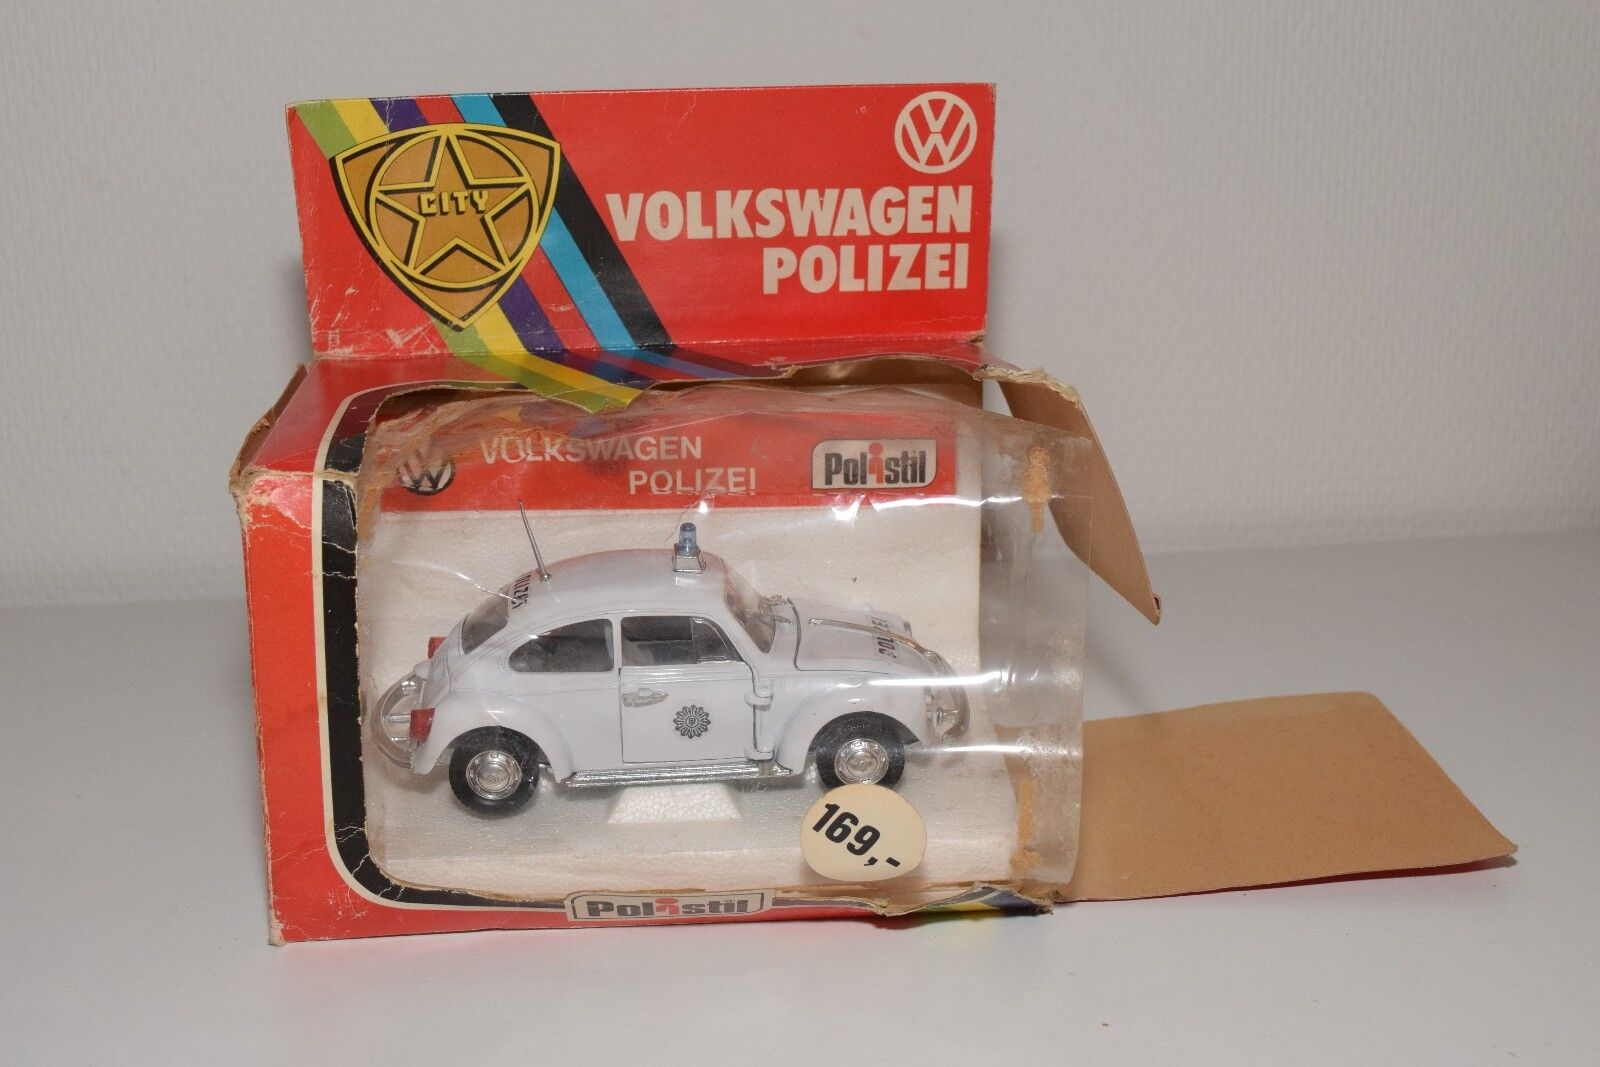 POLISTIL S643 S-643 VW VOLKSWAGEN BEETLE KAFER POLIZEI POLICE VN MINT BOXED RARE